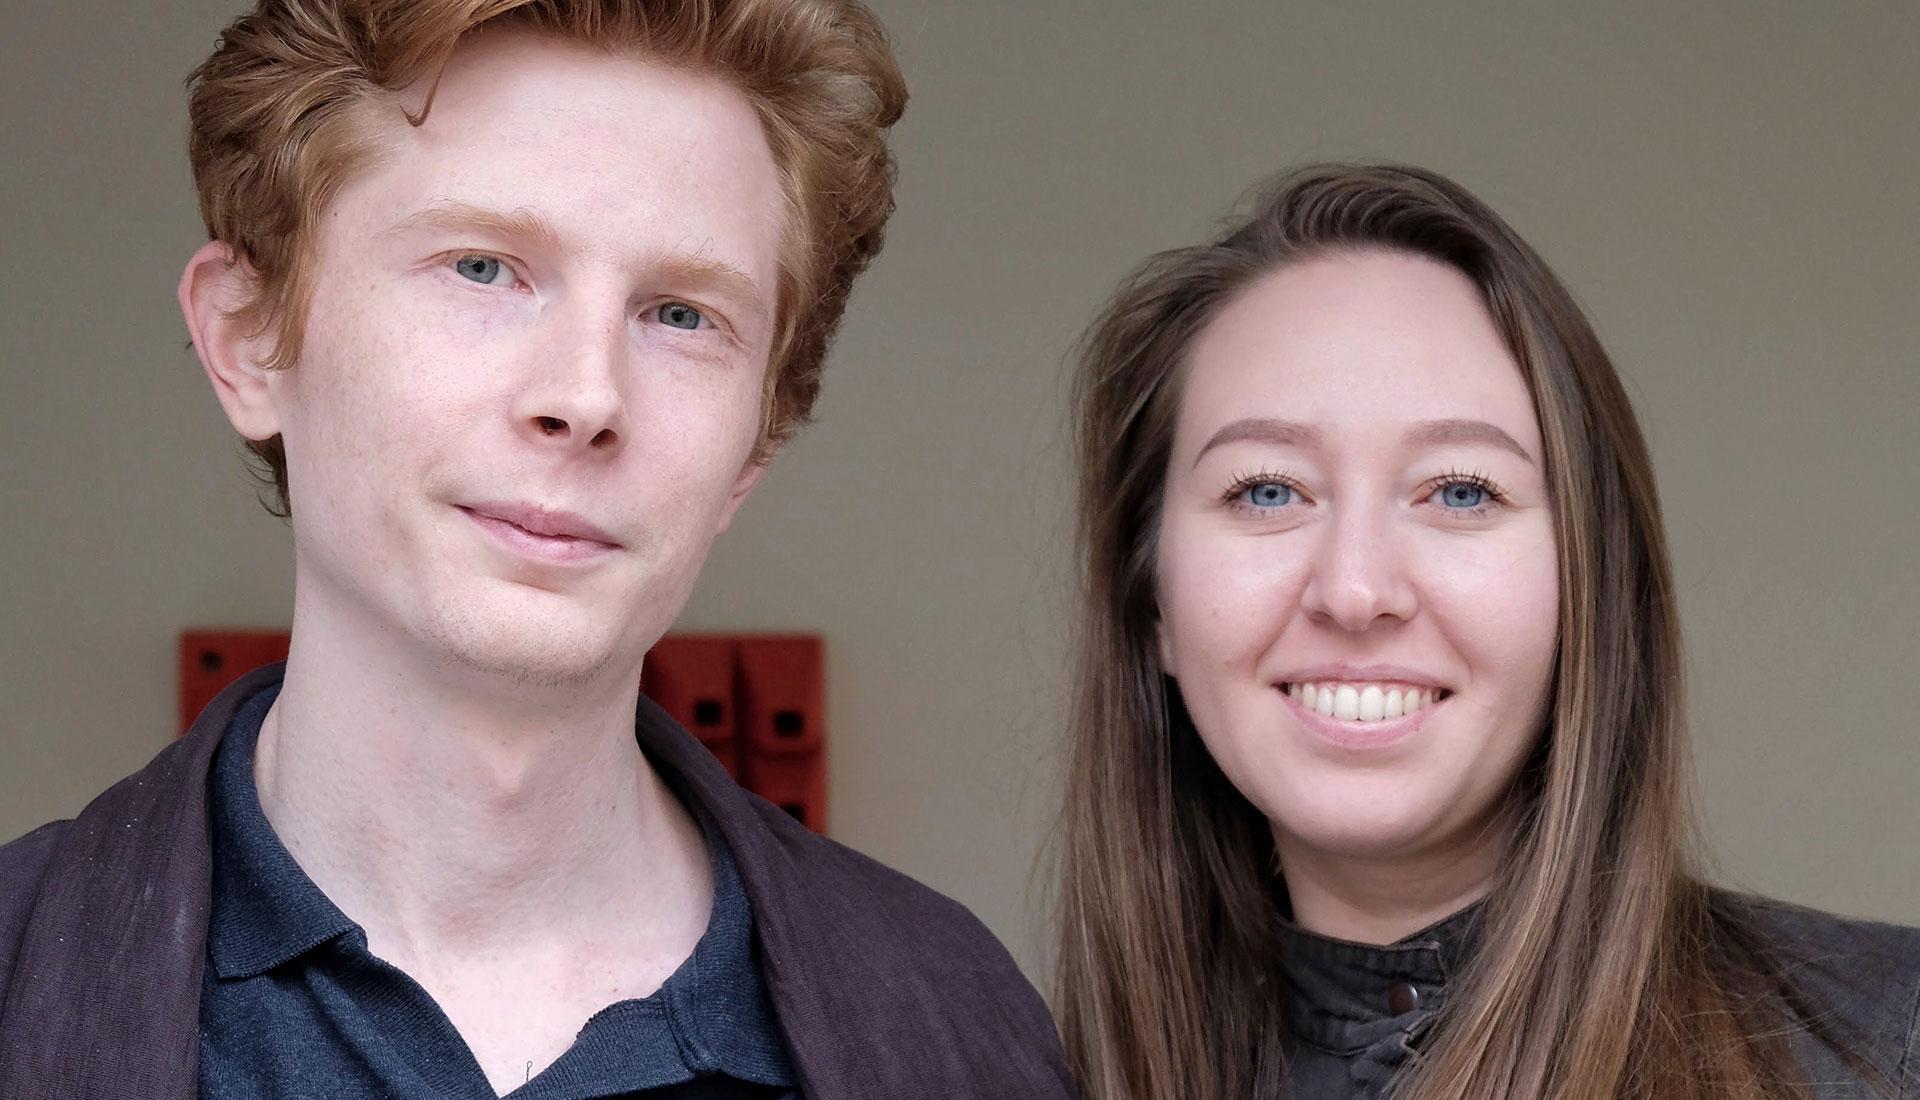 Данил Карамушкин и Анна Иванова фото